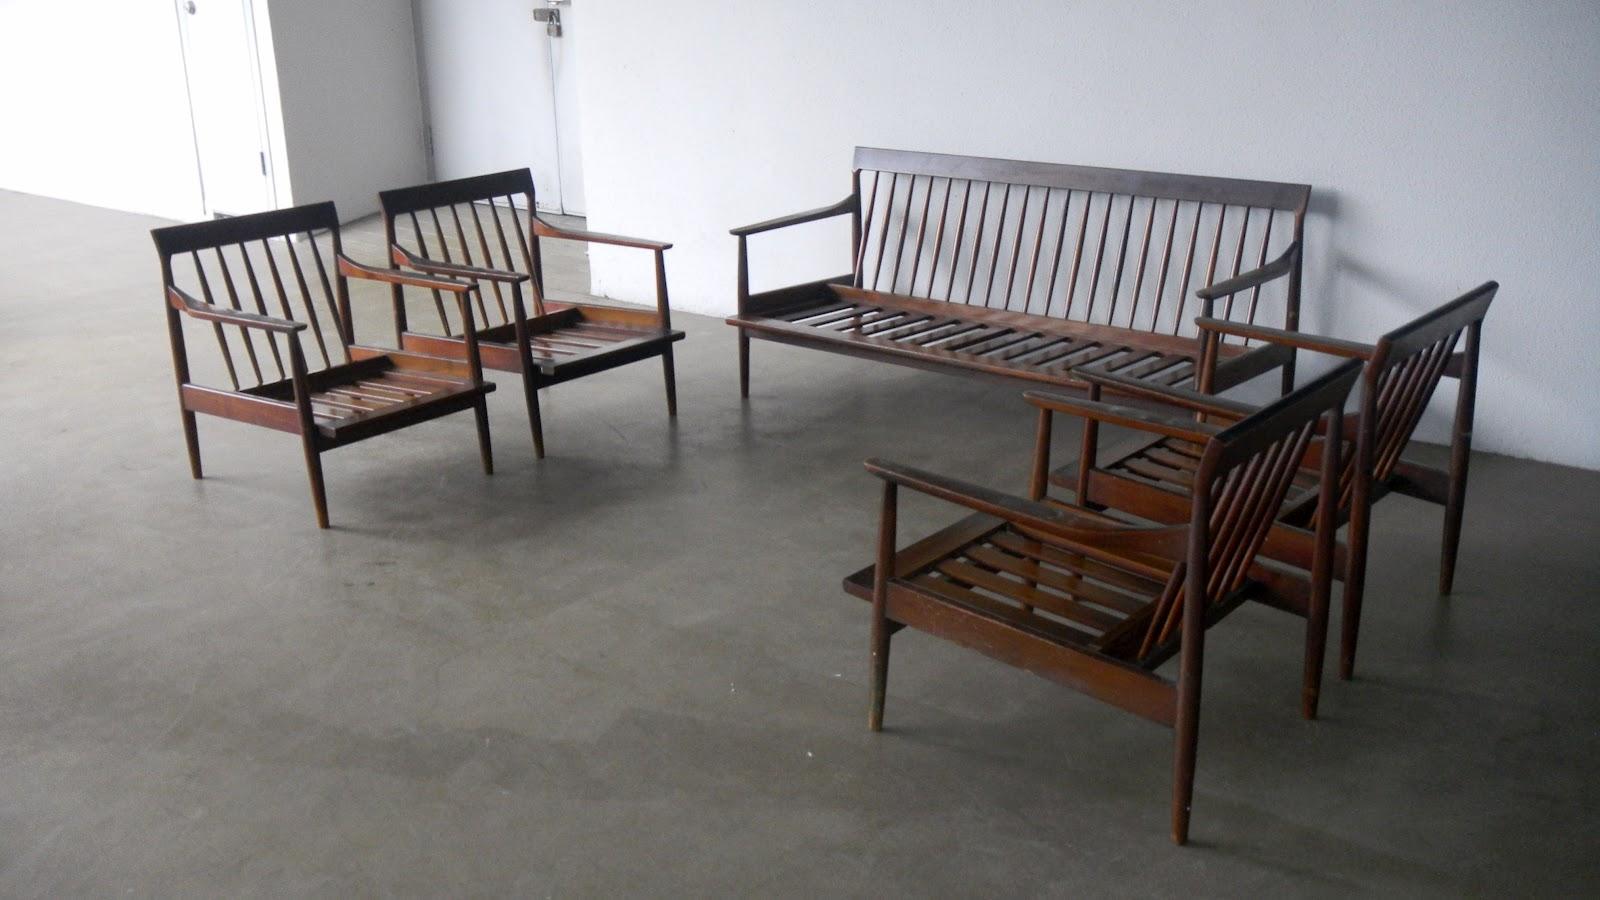 Why Vintage Ashley Furniture